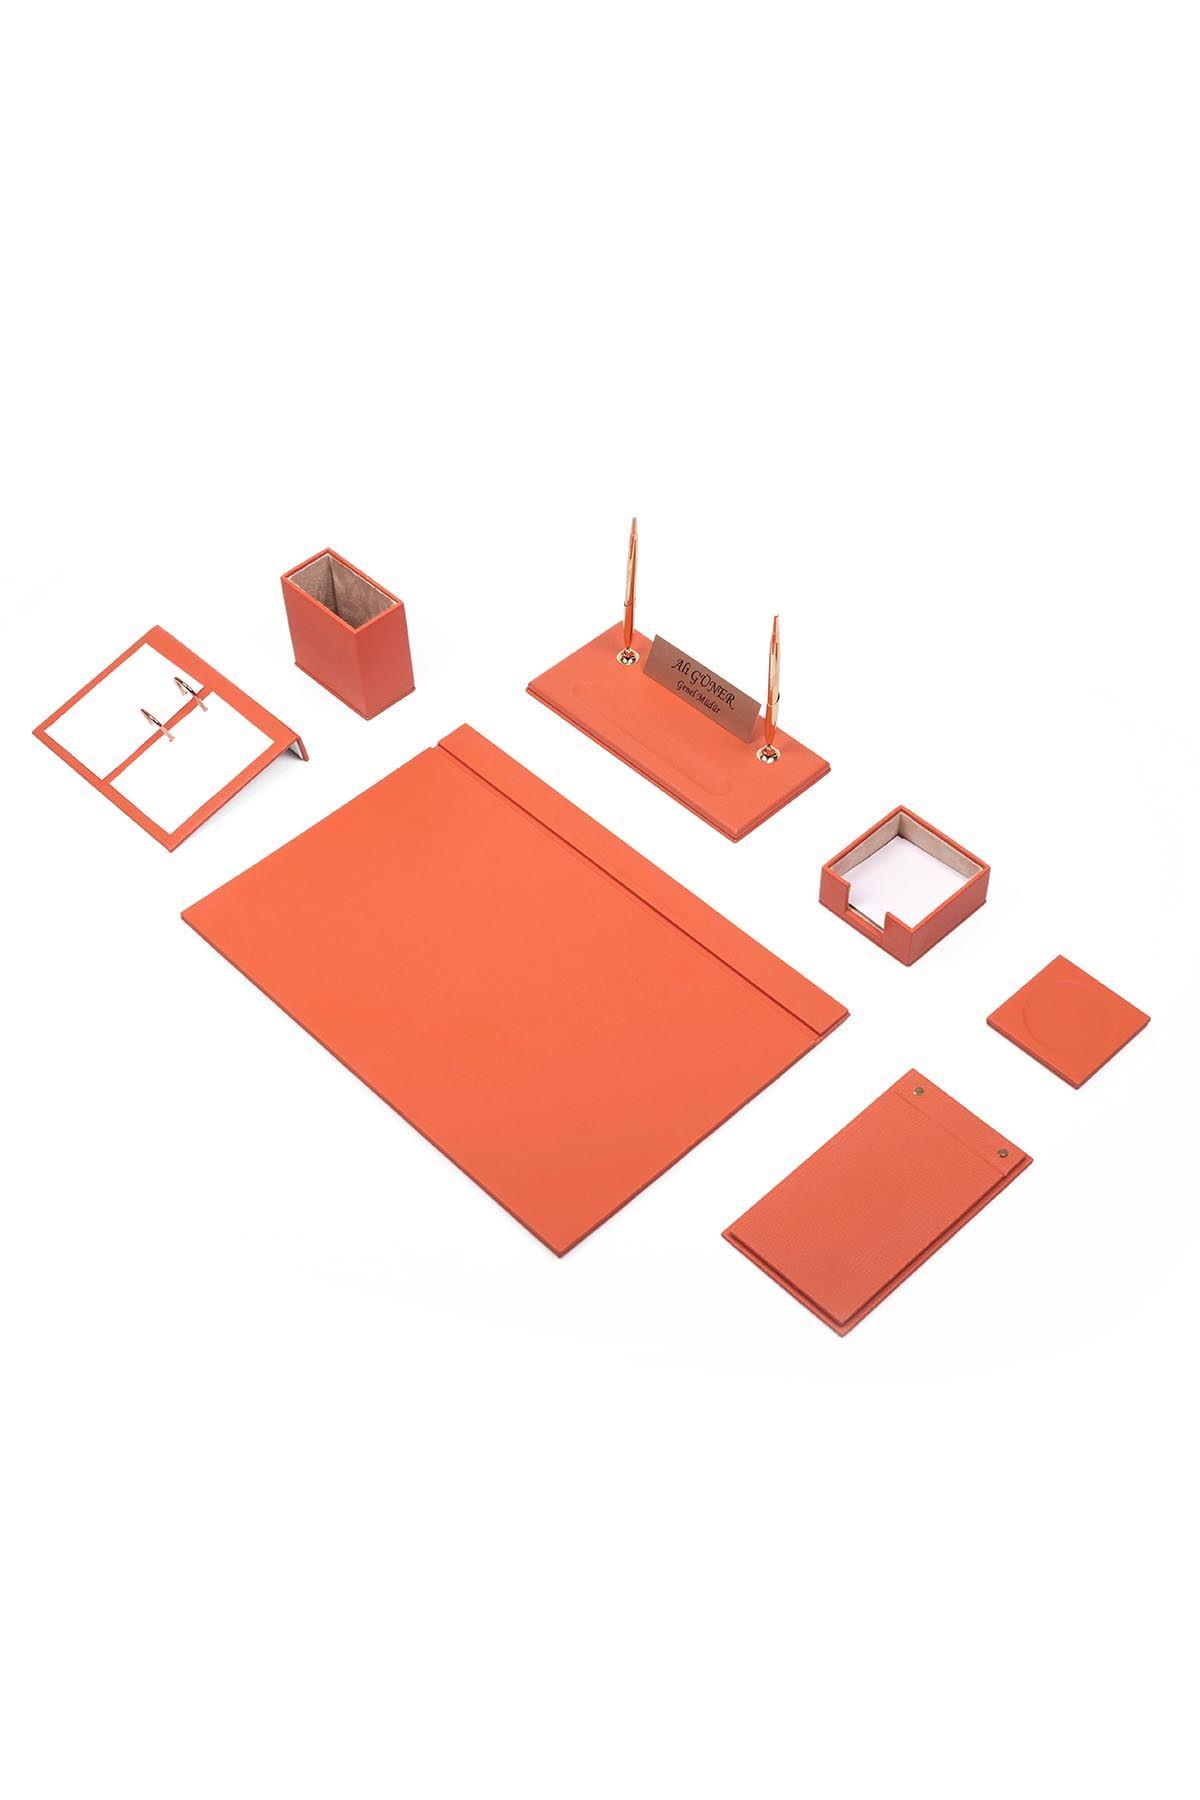 Leather Desk Set 9 Accessories Orange